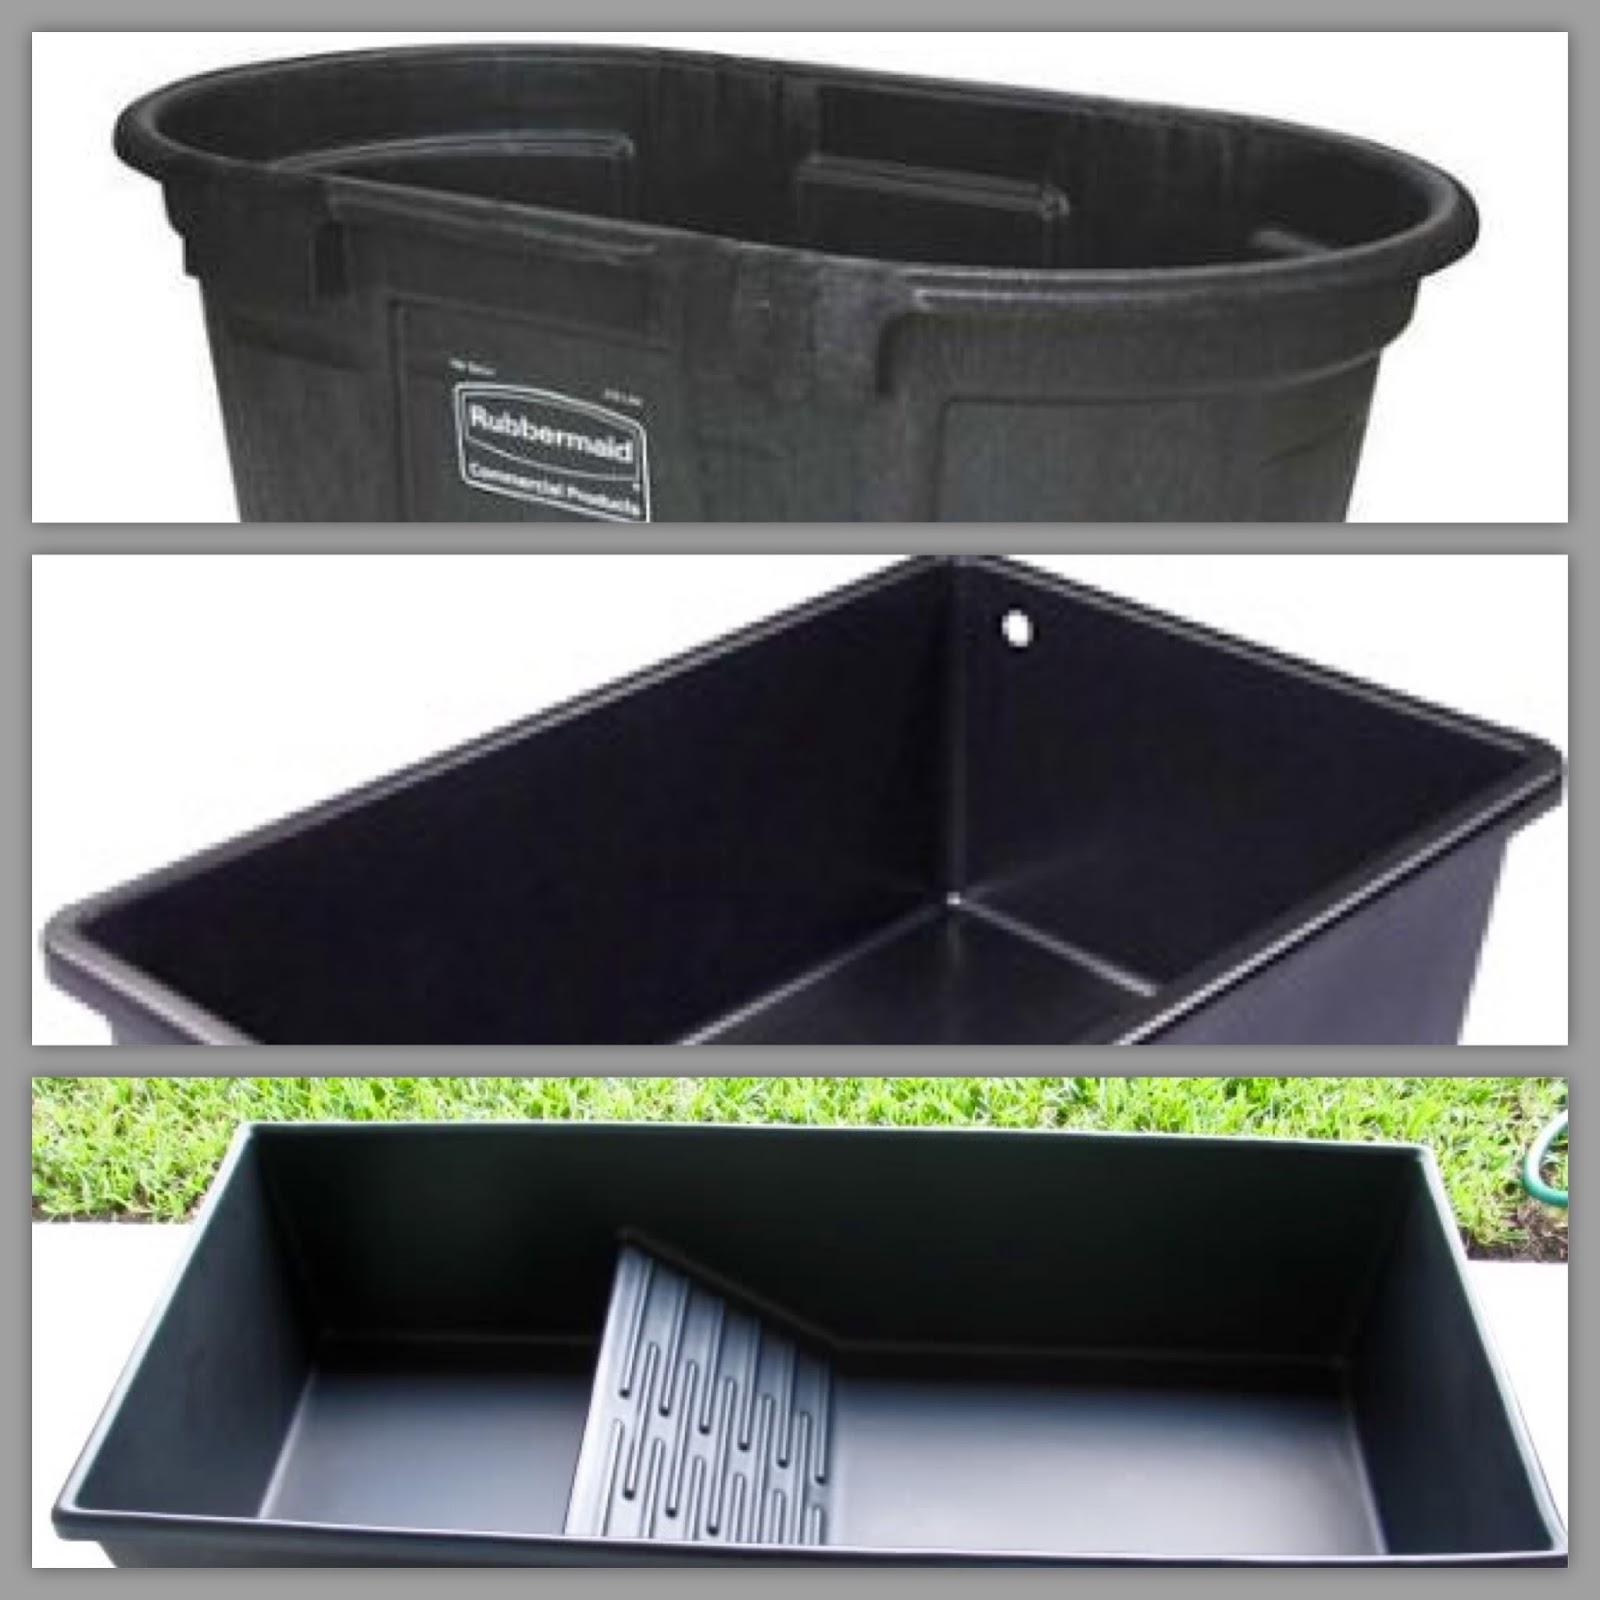 Turtle base blog stock tanks vs waterland tub vs laguna Plastic pond tubs